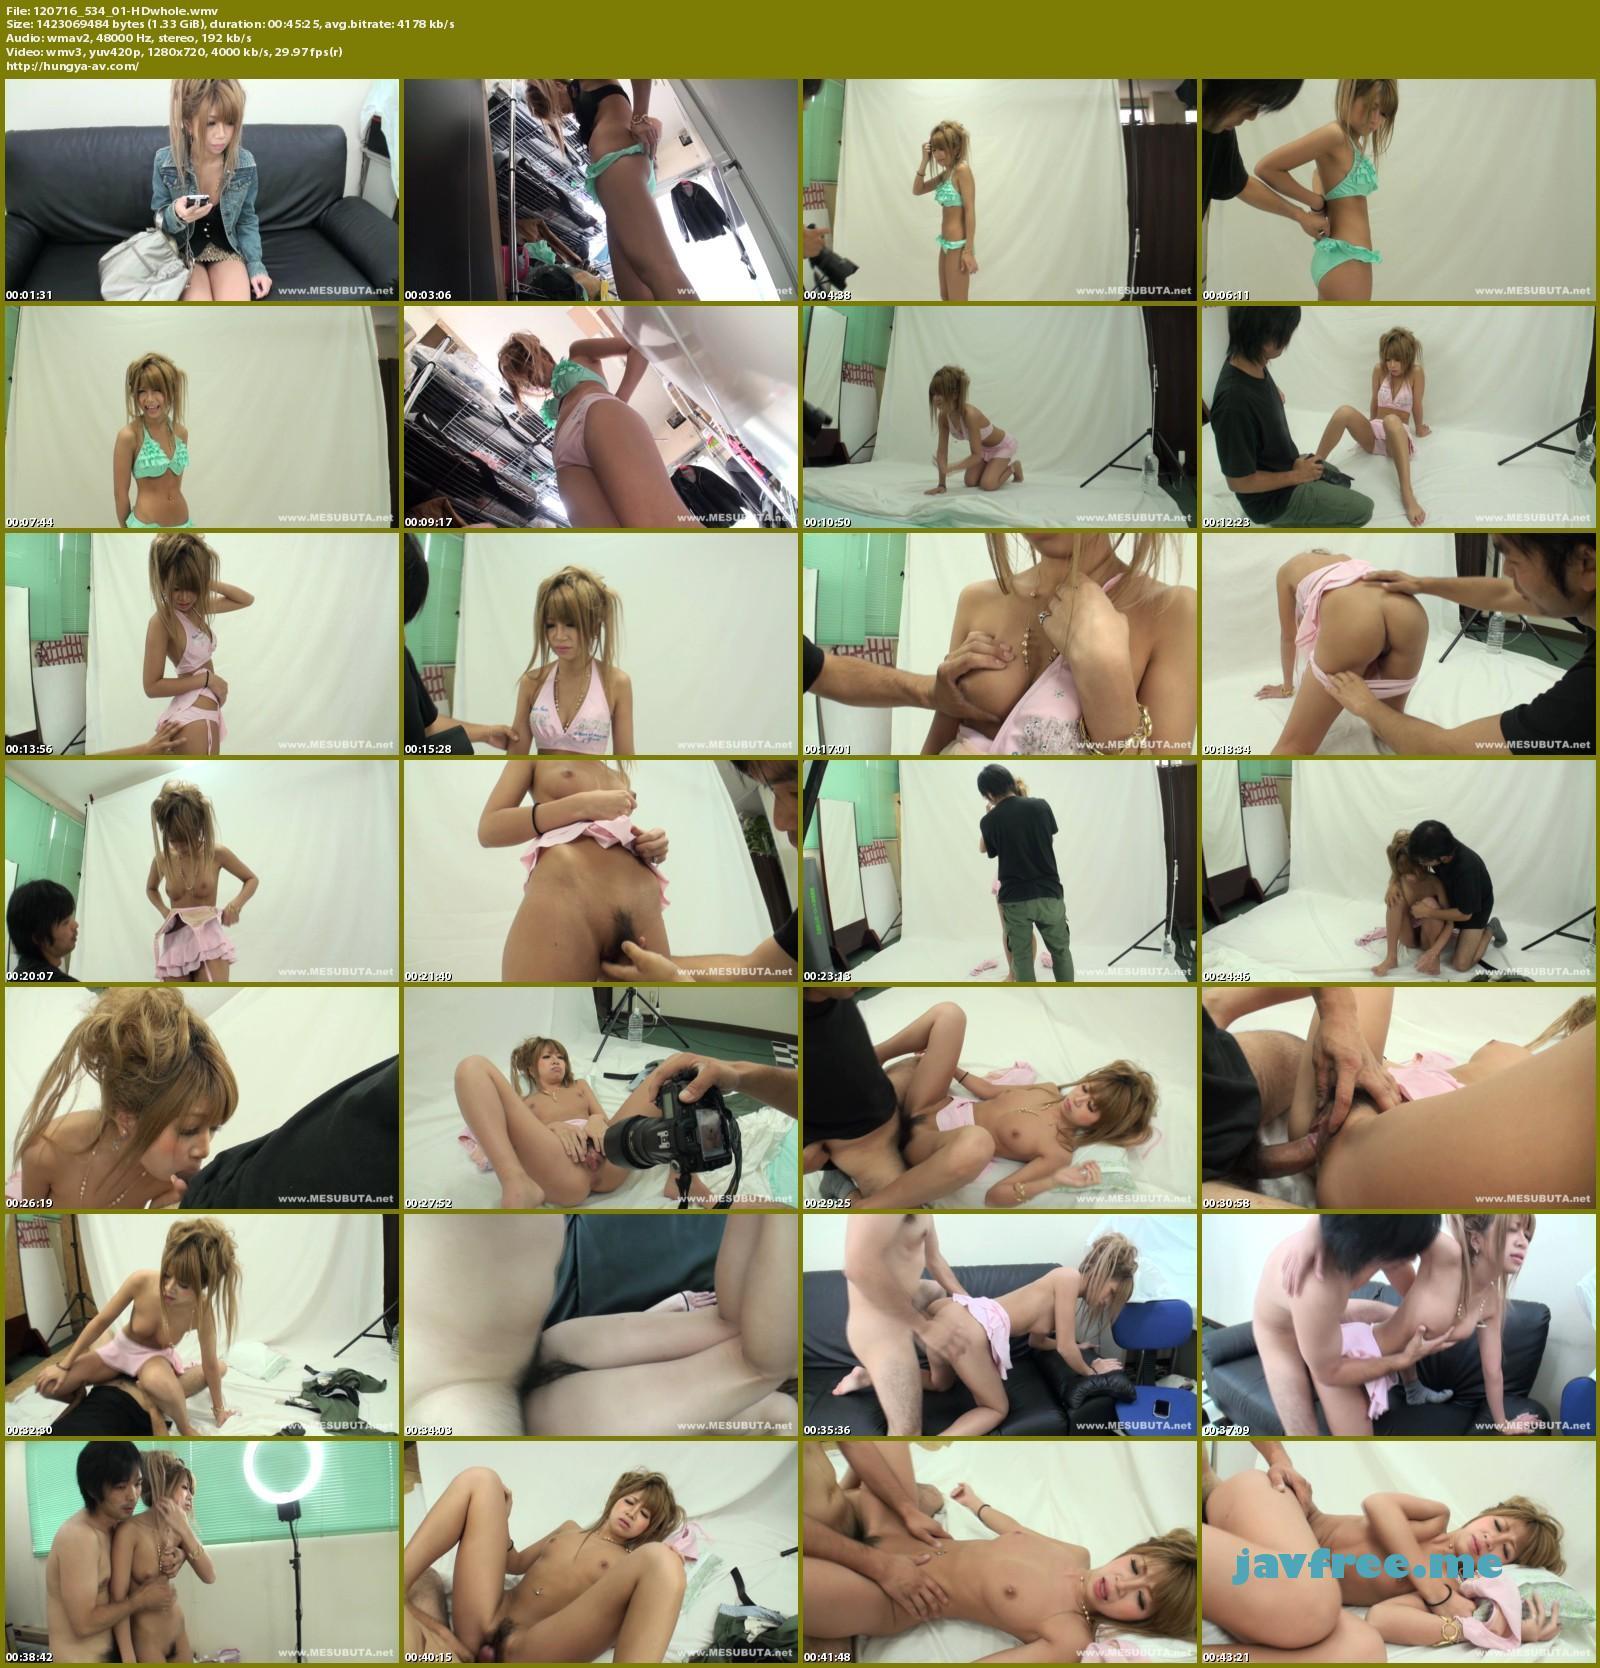 Mesubuta (メス豚 2)120716_534_01-某芸能プロダクション危険流出映像